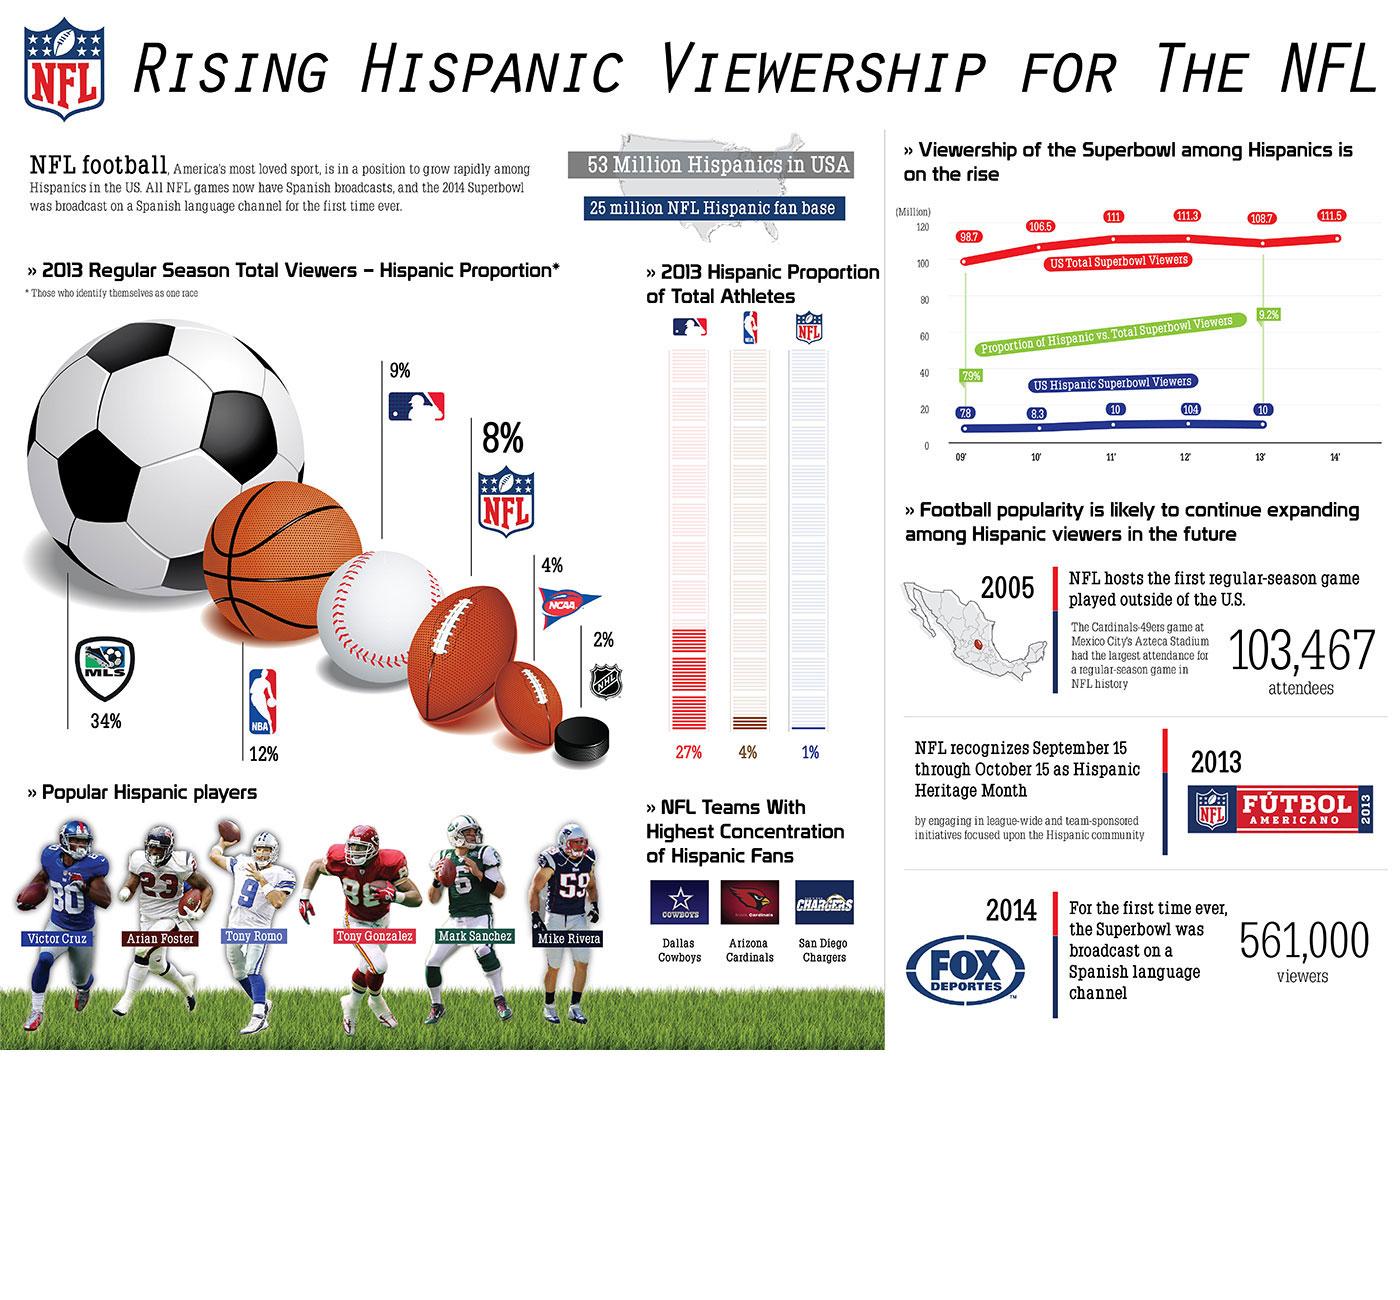 Market Research Infographic - Hispanic Viewership